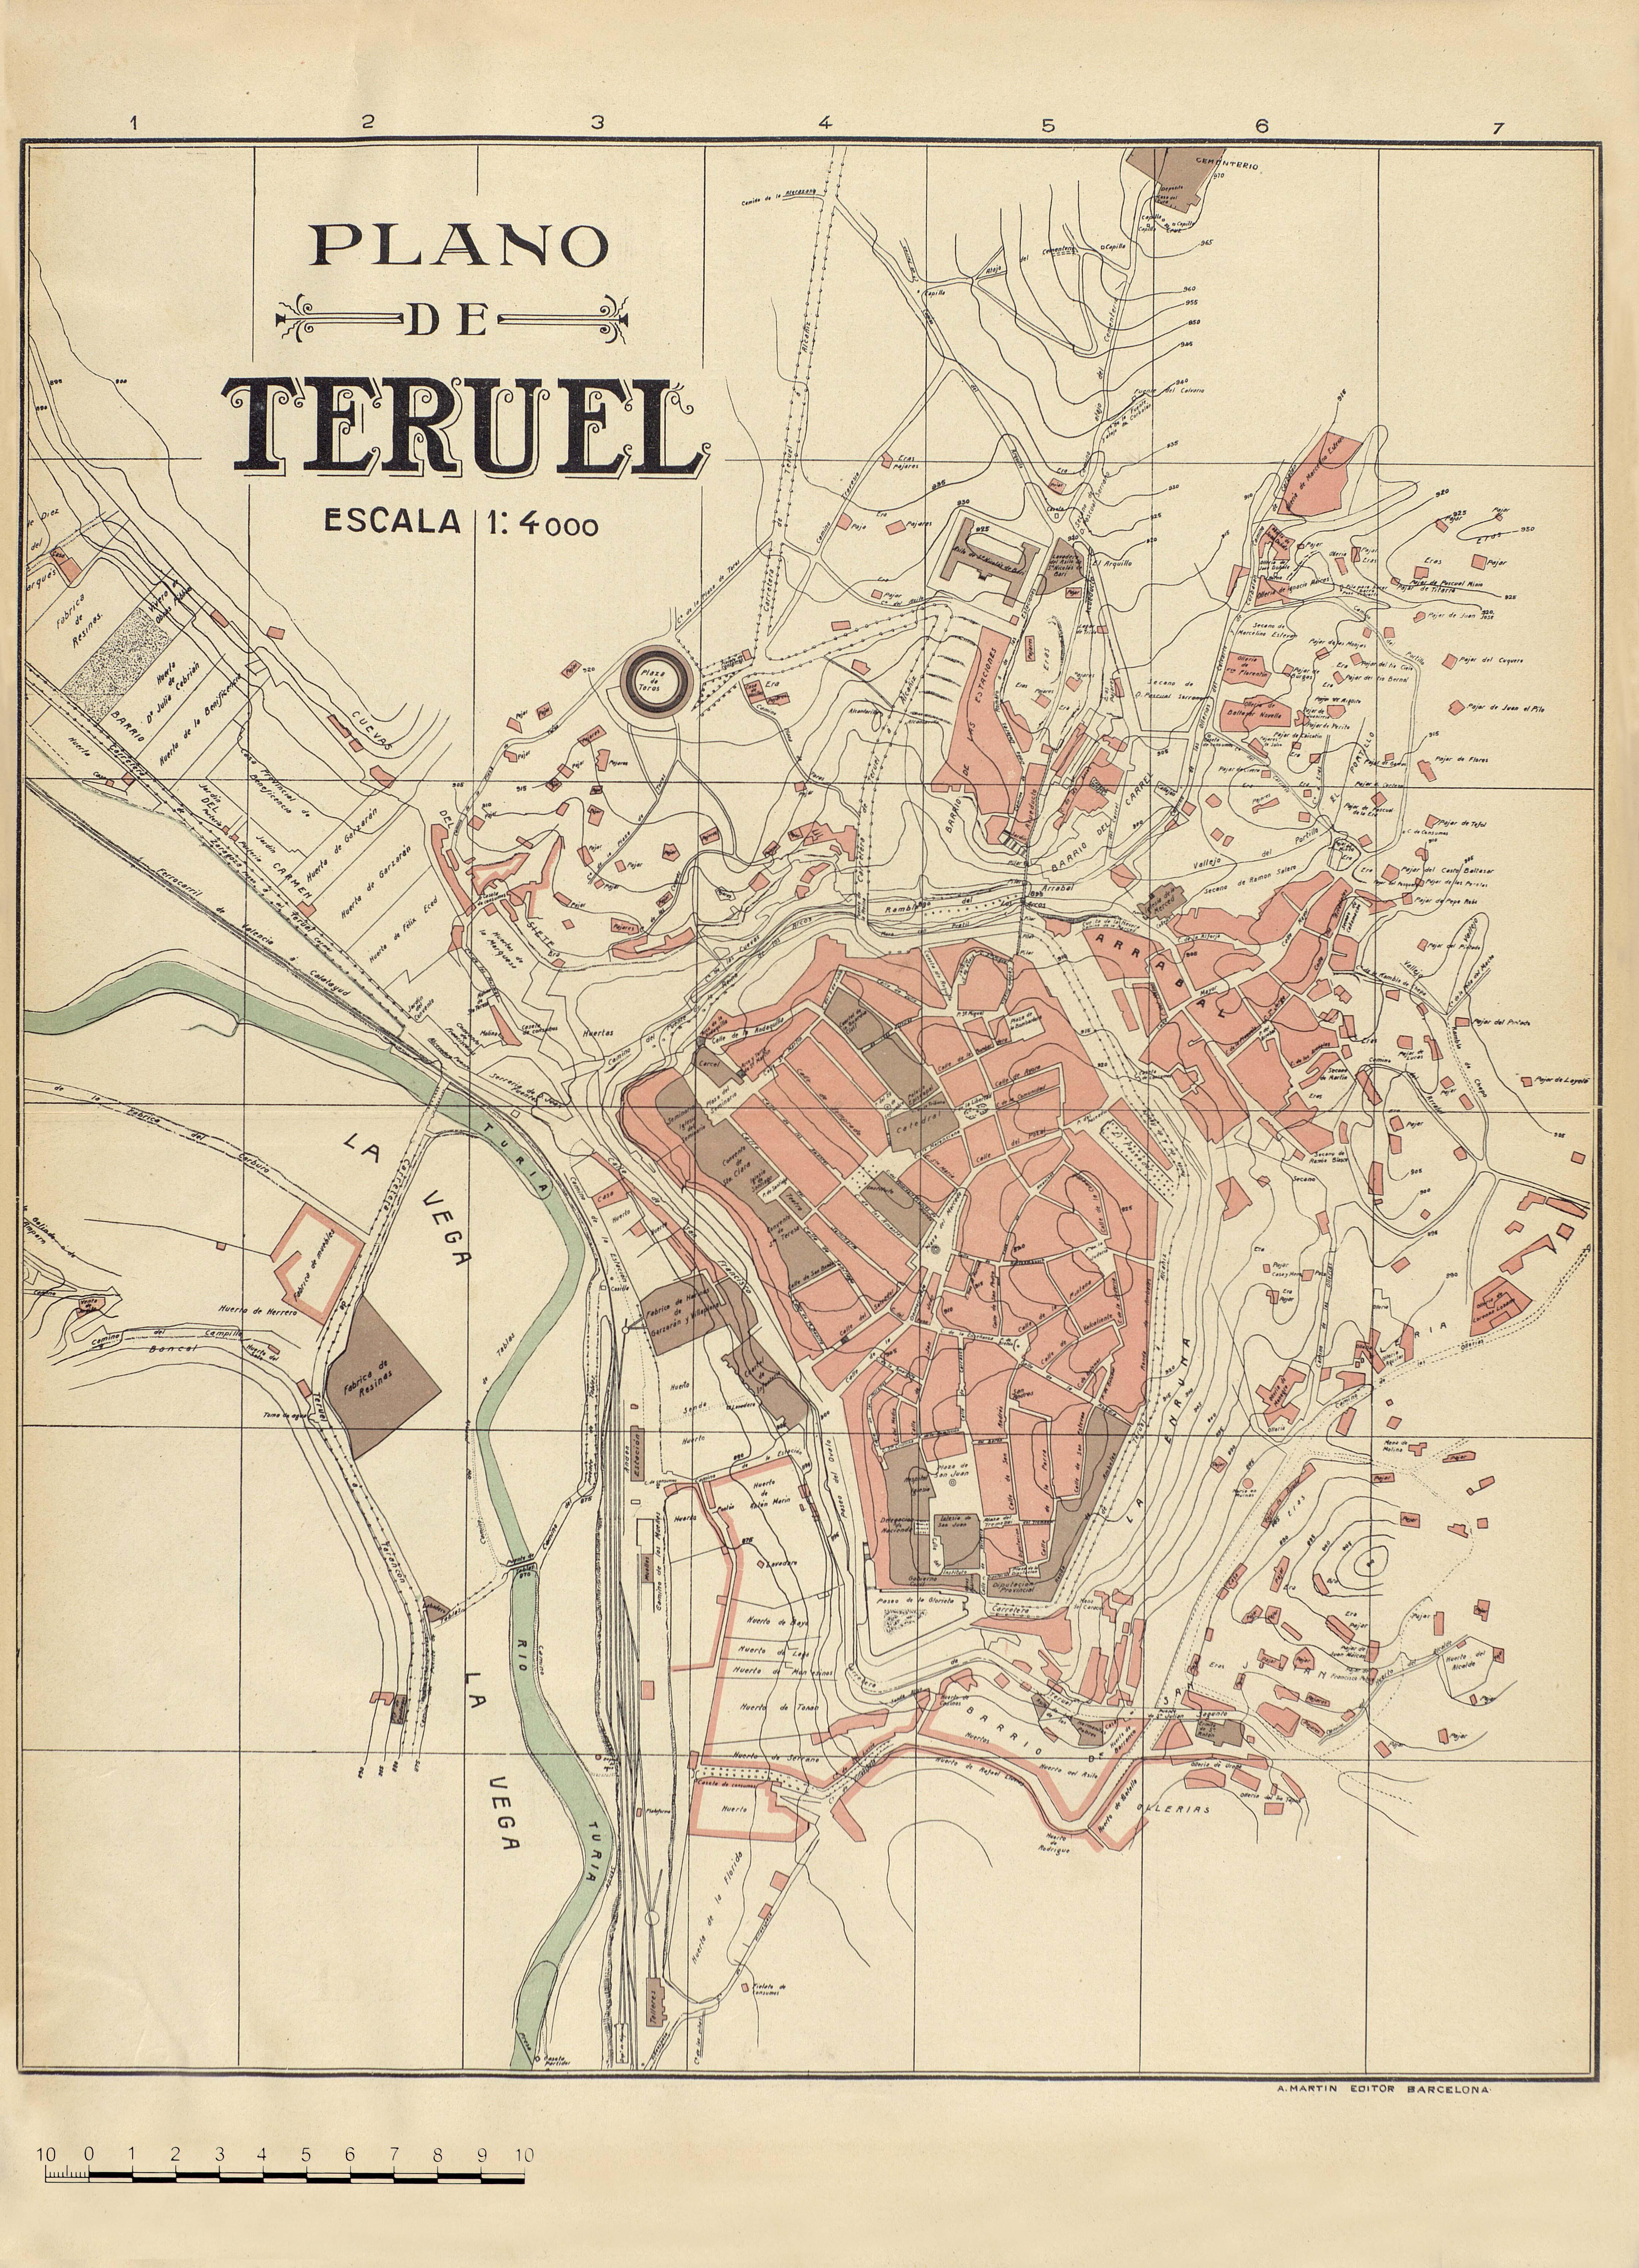 Plano de Teruel